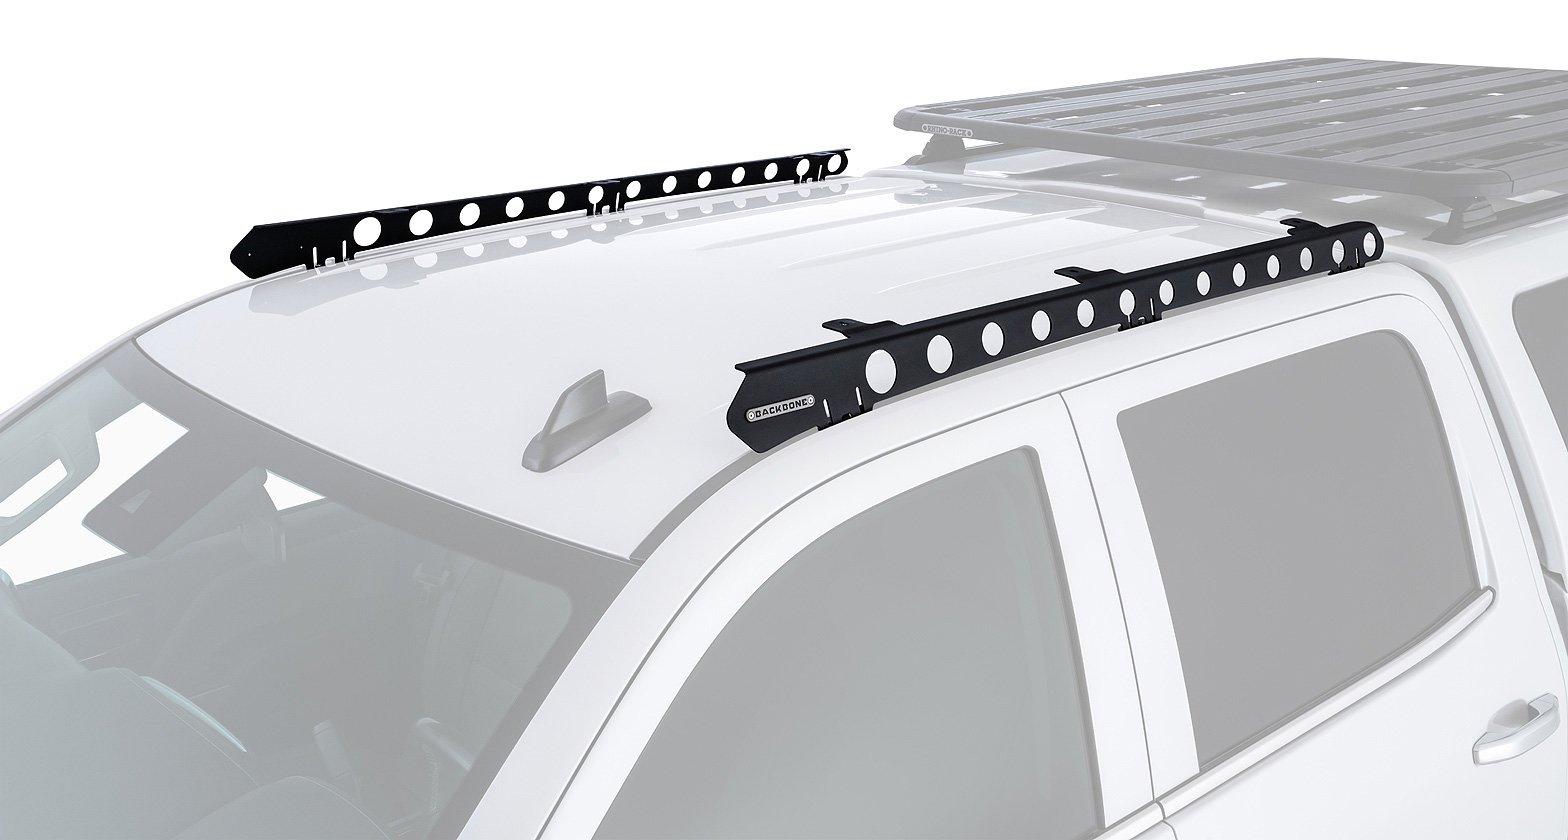 Chevrolet Silverado Backbone image